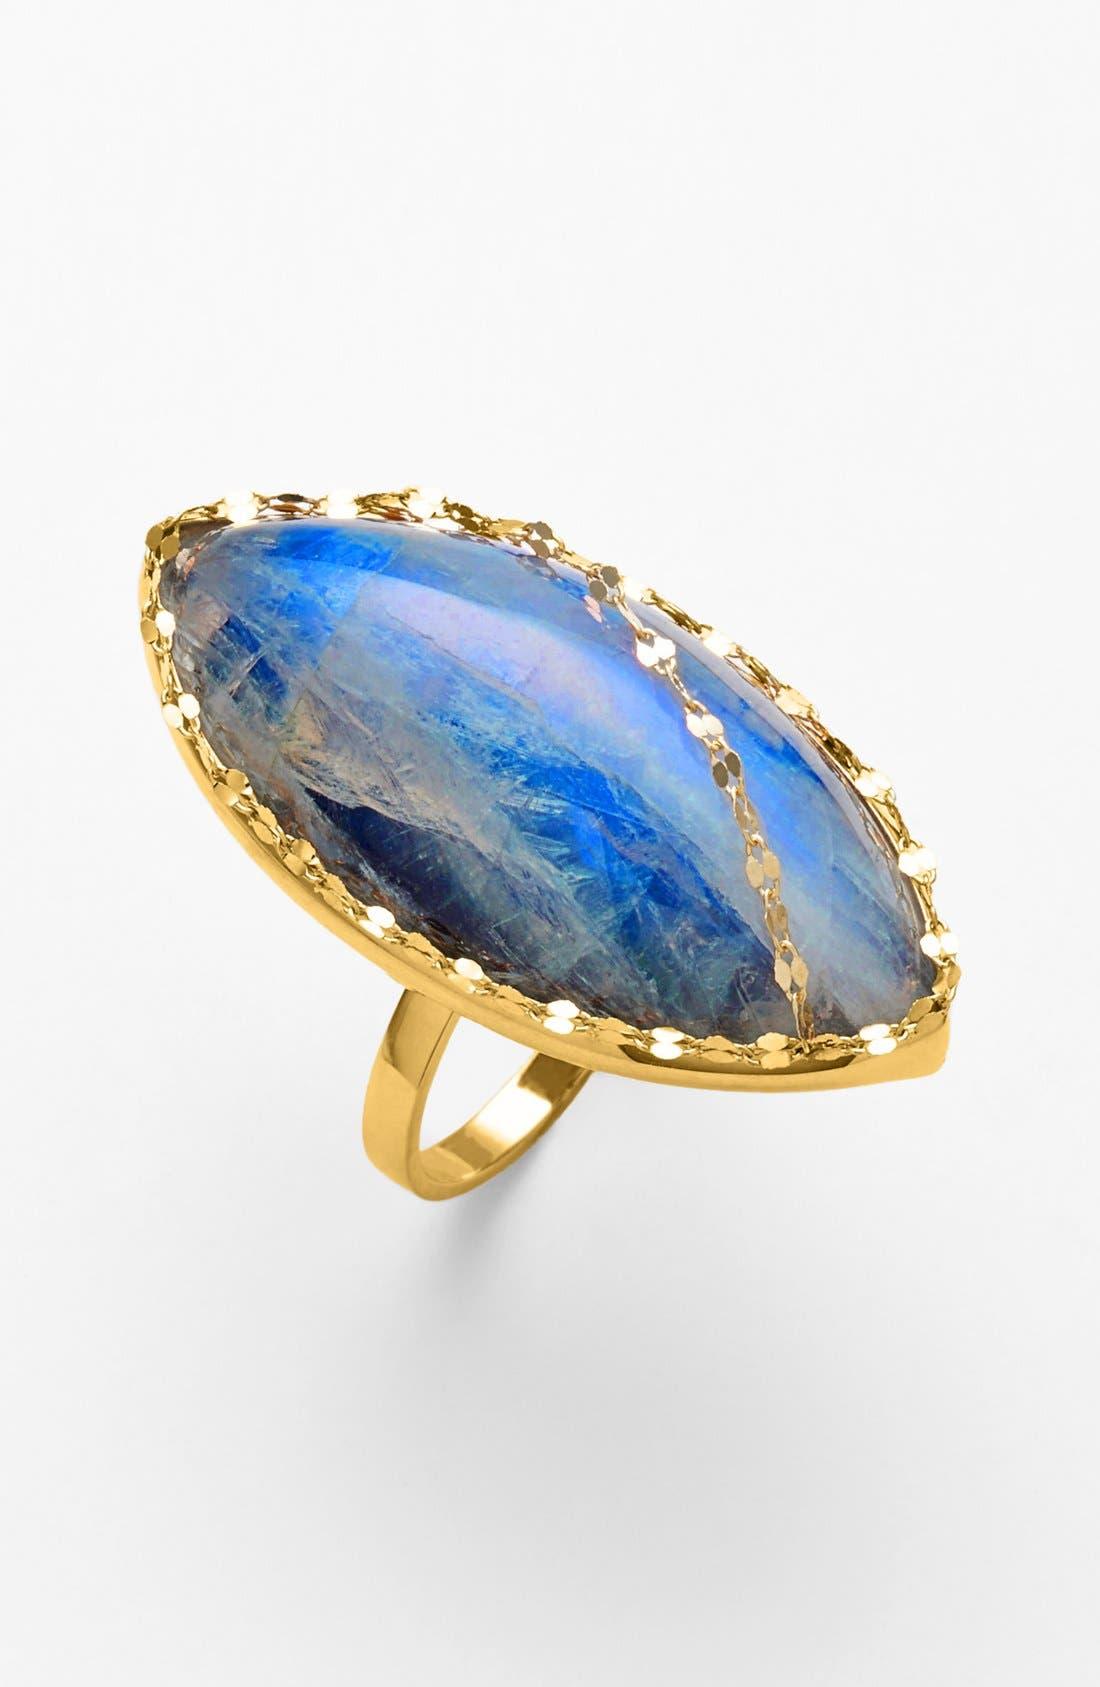 Alternate Image 1 Selected - Lana Jewelry 'Mesmerize - Mood' Stone Statement Ring